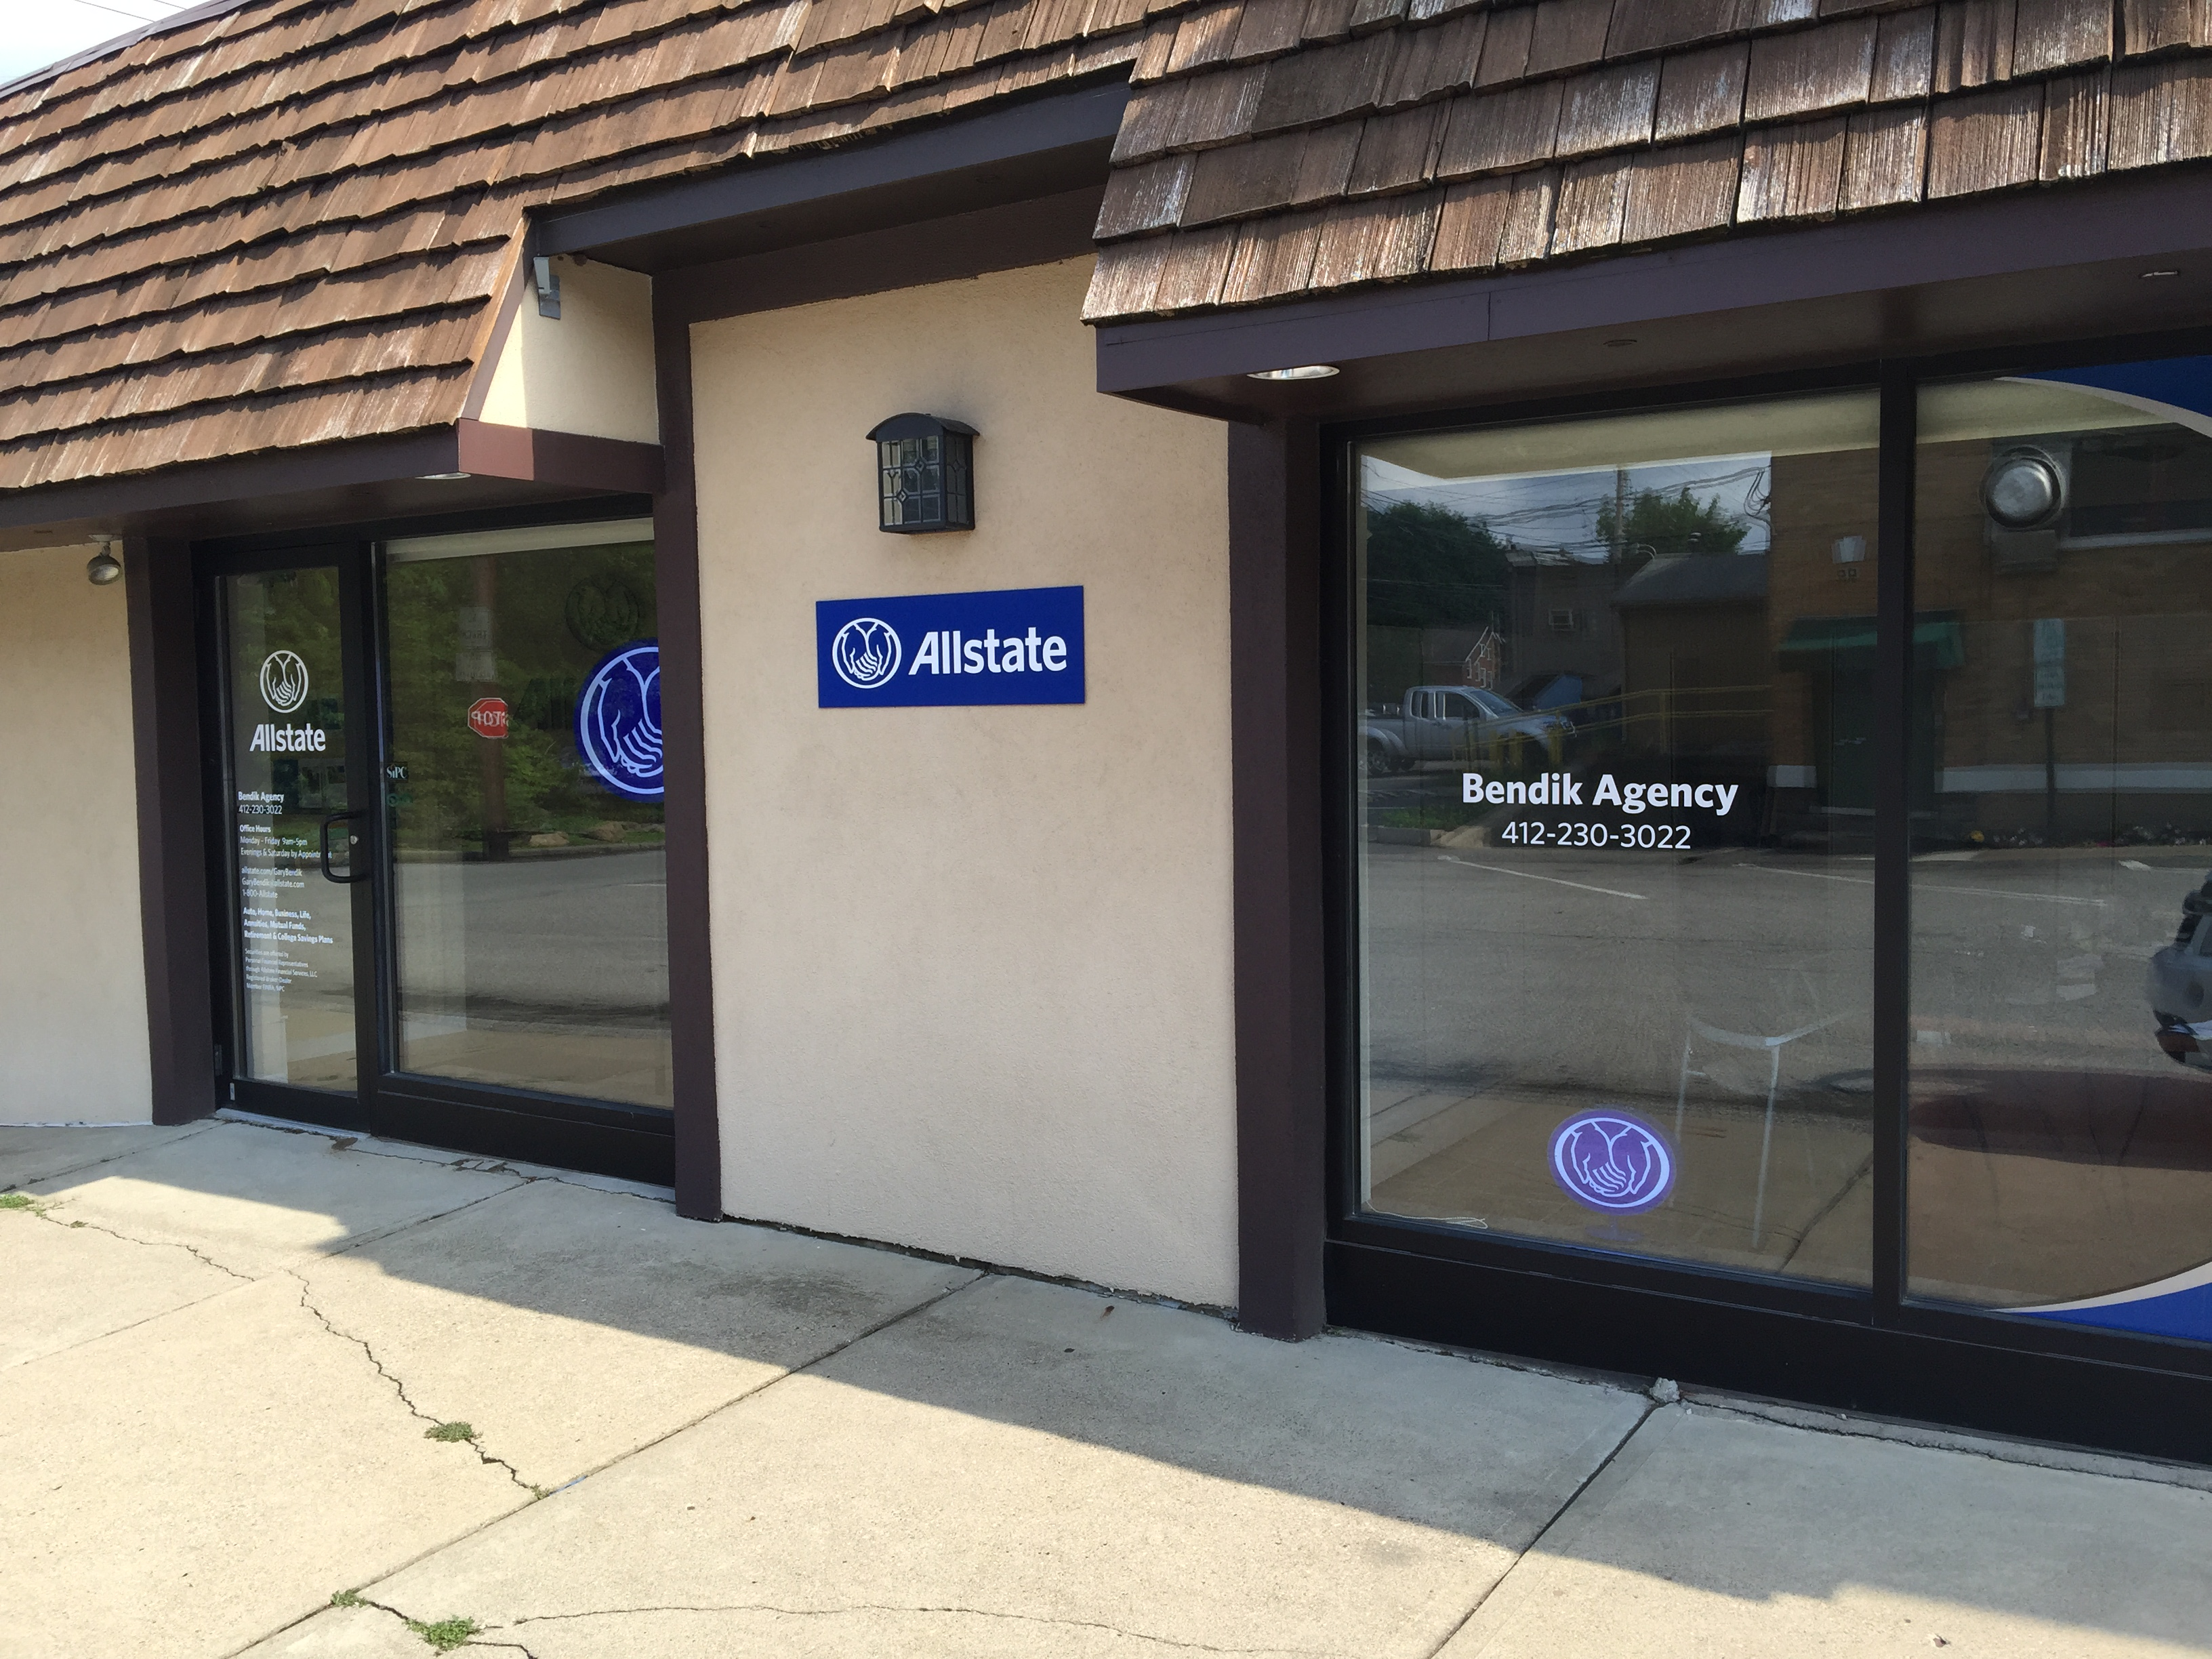 Gary Bendik: Allstate Insurance image 5